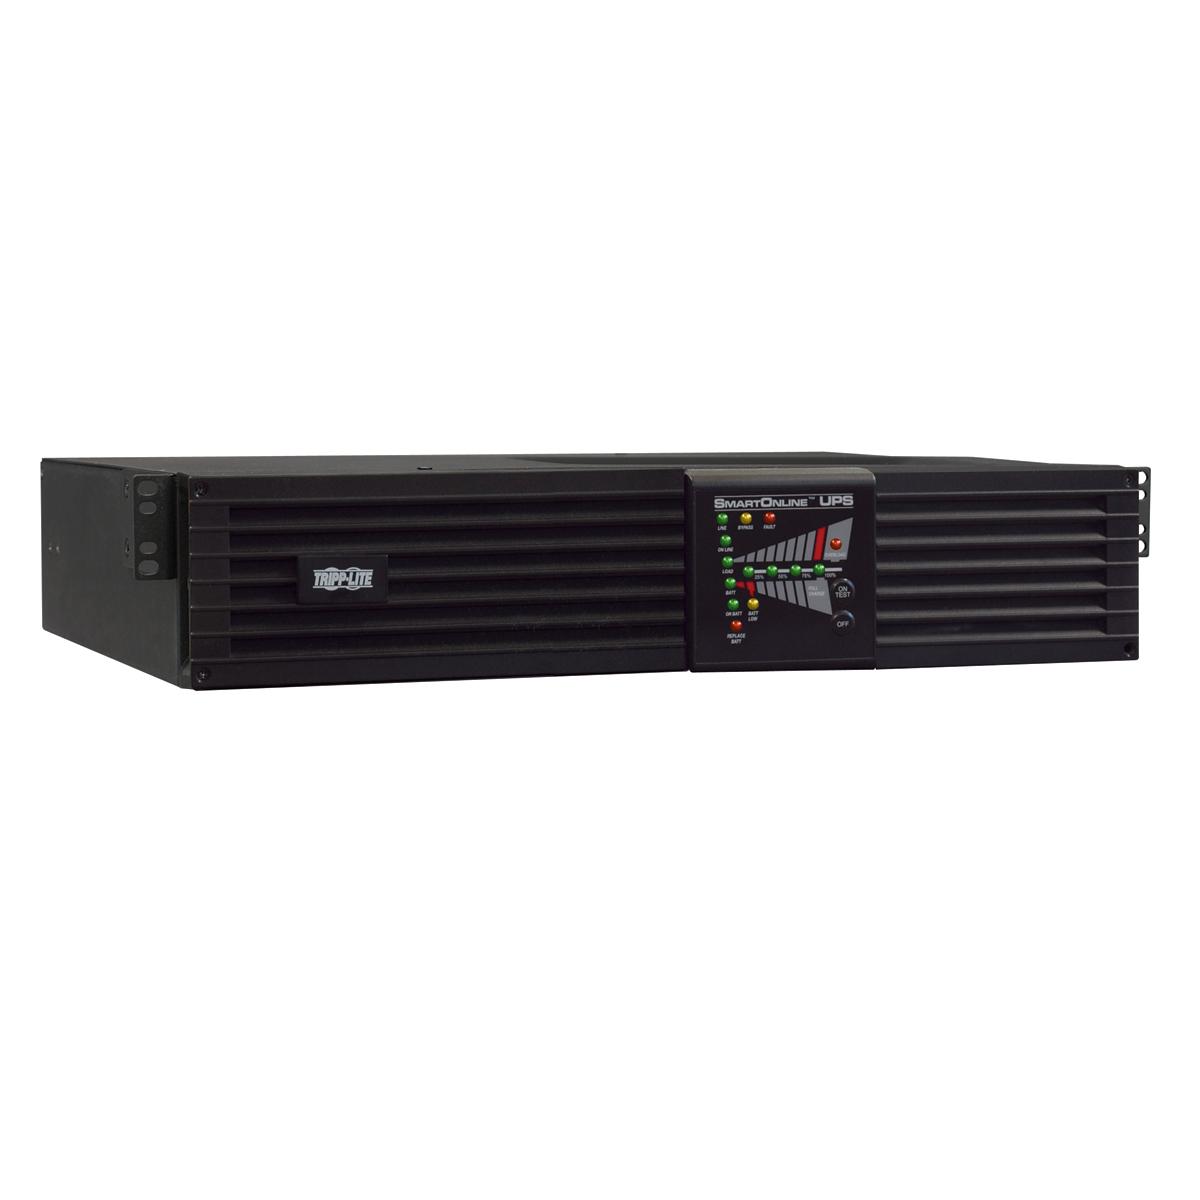 Tripp Lite SmartOnline 208/240, 230V 3kVA 2.5kW Double-Conversion UPS, 2U Rack/Tower, Extended Run, Network Card Options, USB, DB9 Serial